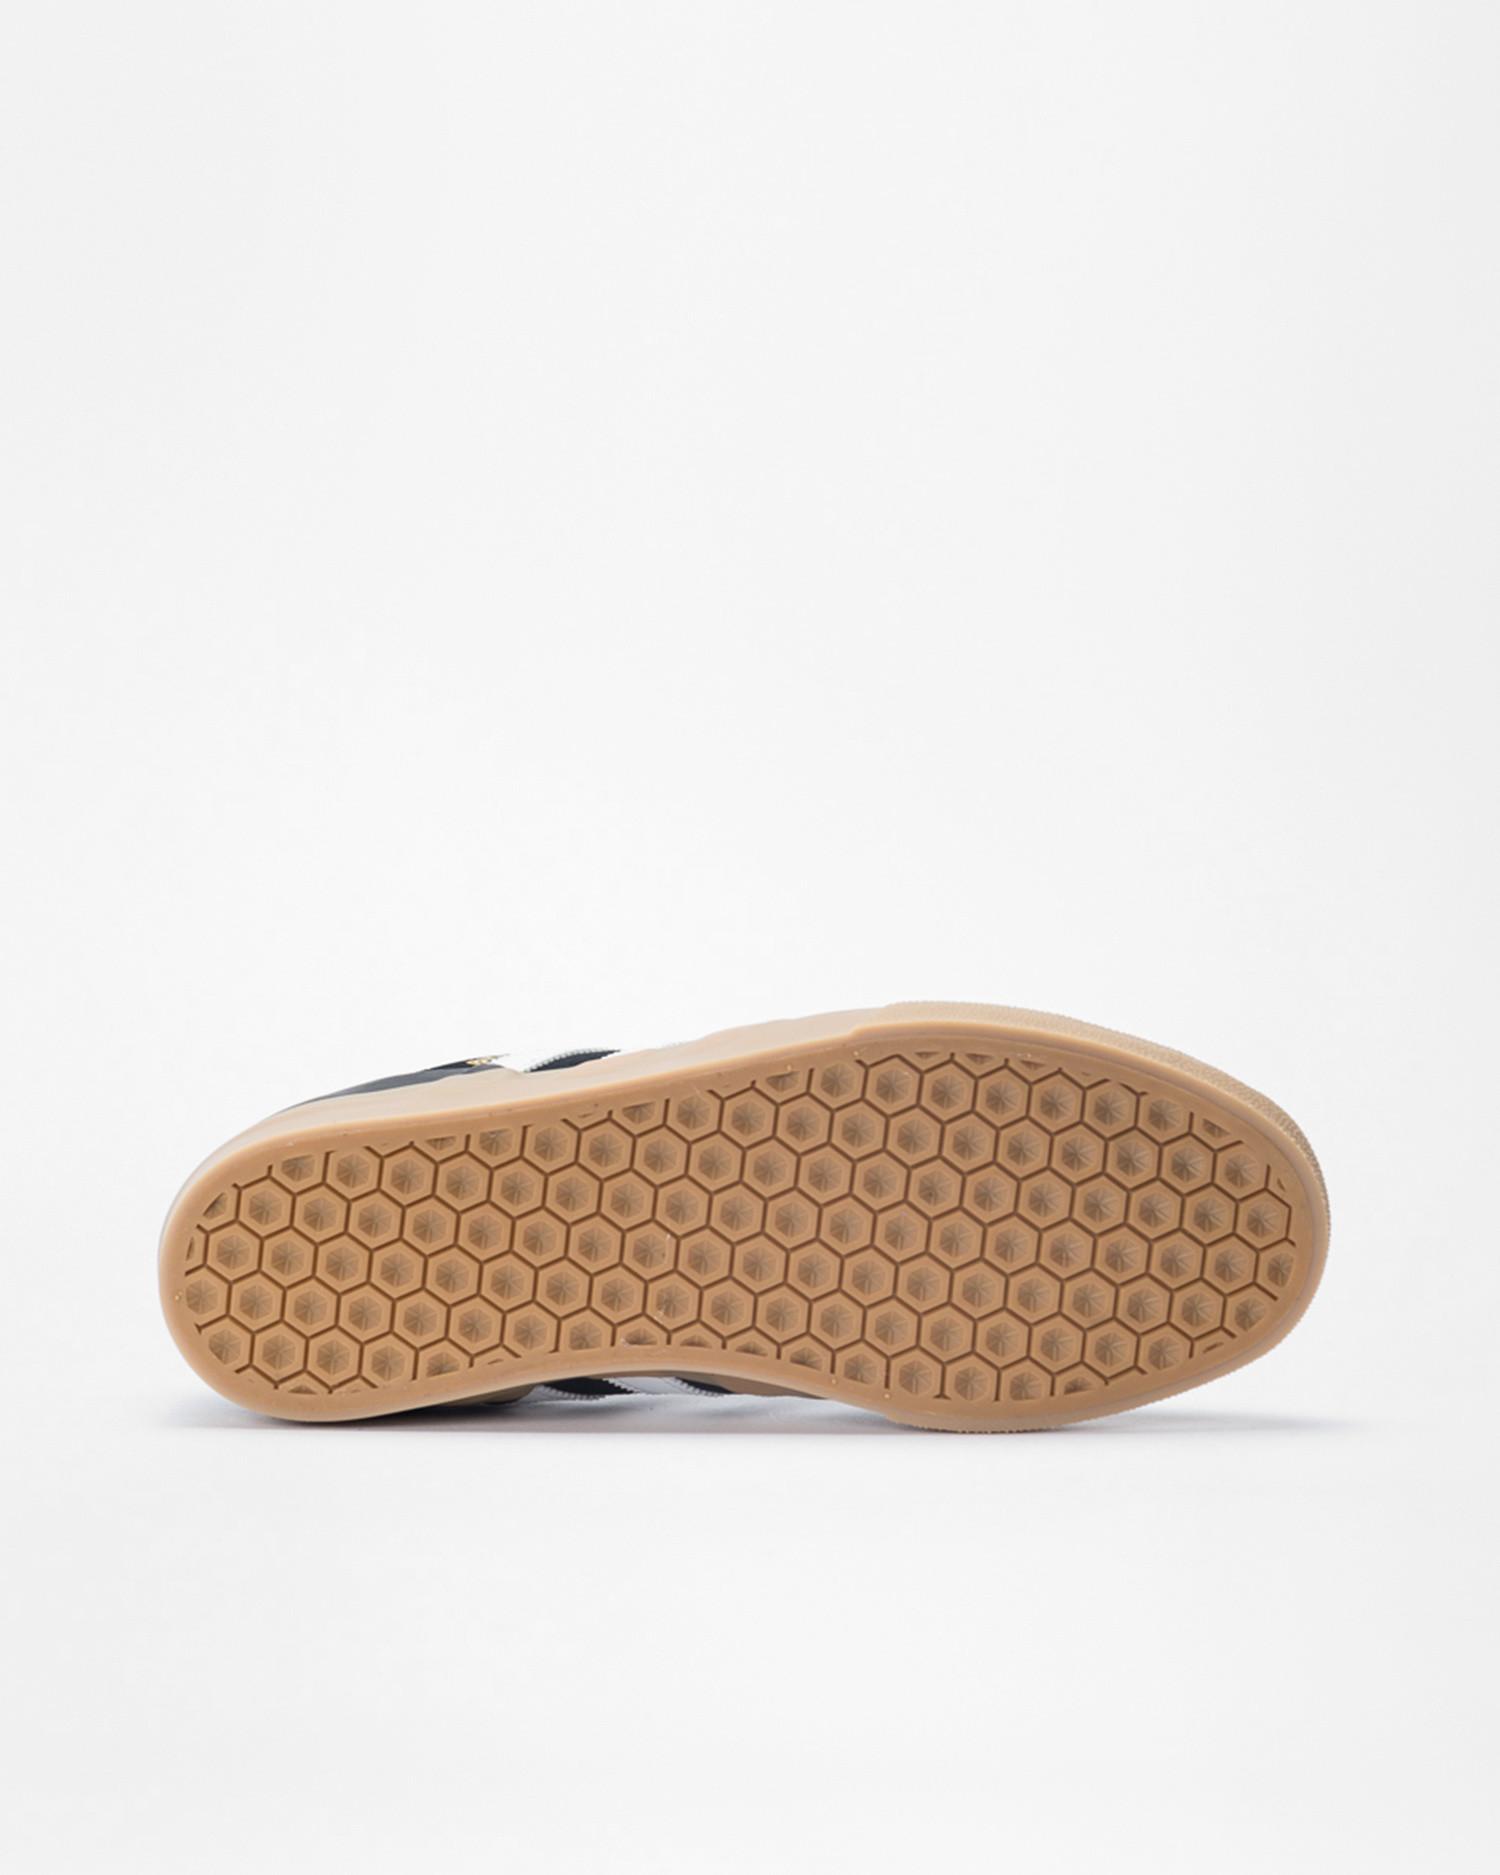 Adidas Busenitz Vulc II Core black/Footwear White/Gum4